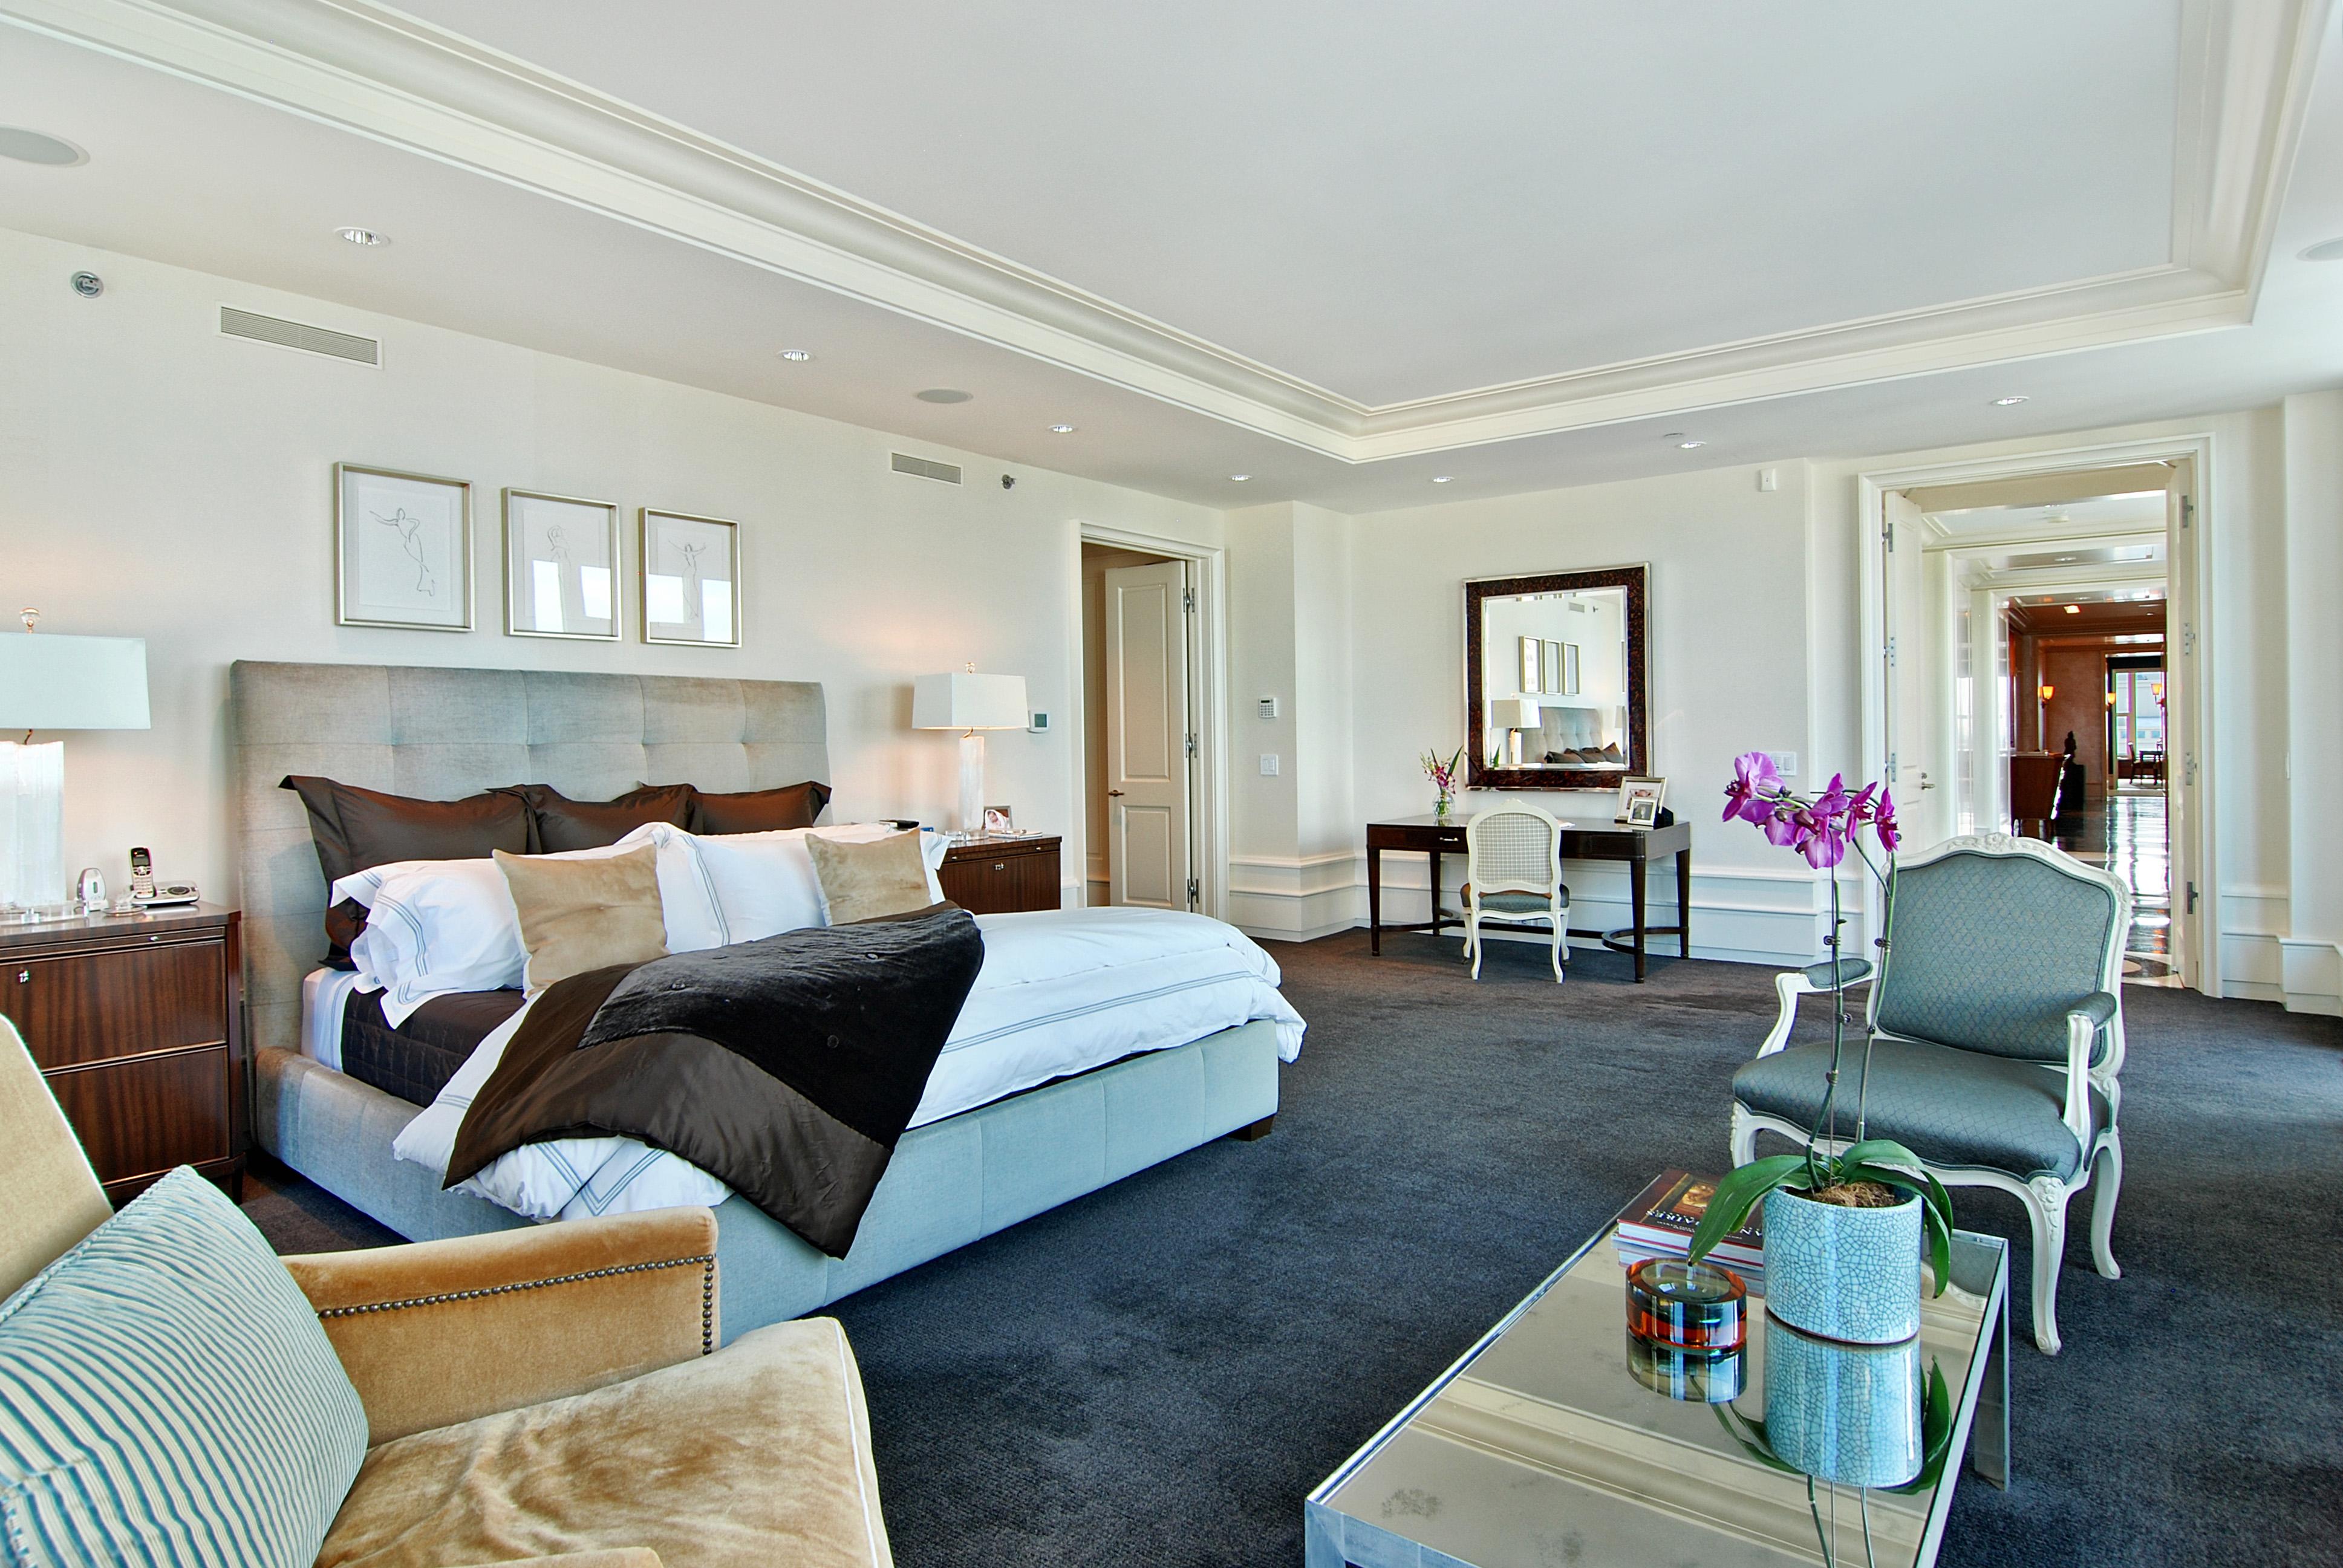 Master Bedroom Oasis - The VHT Studios Blog